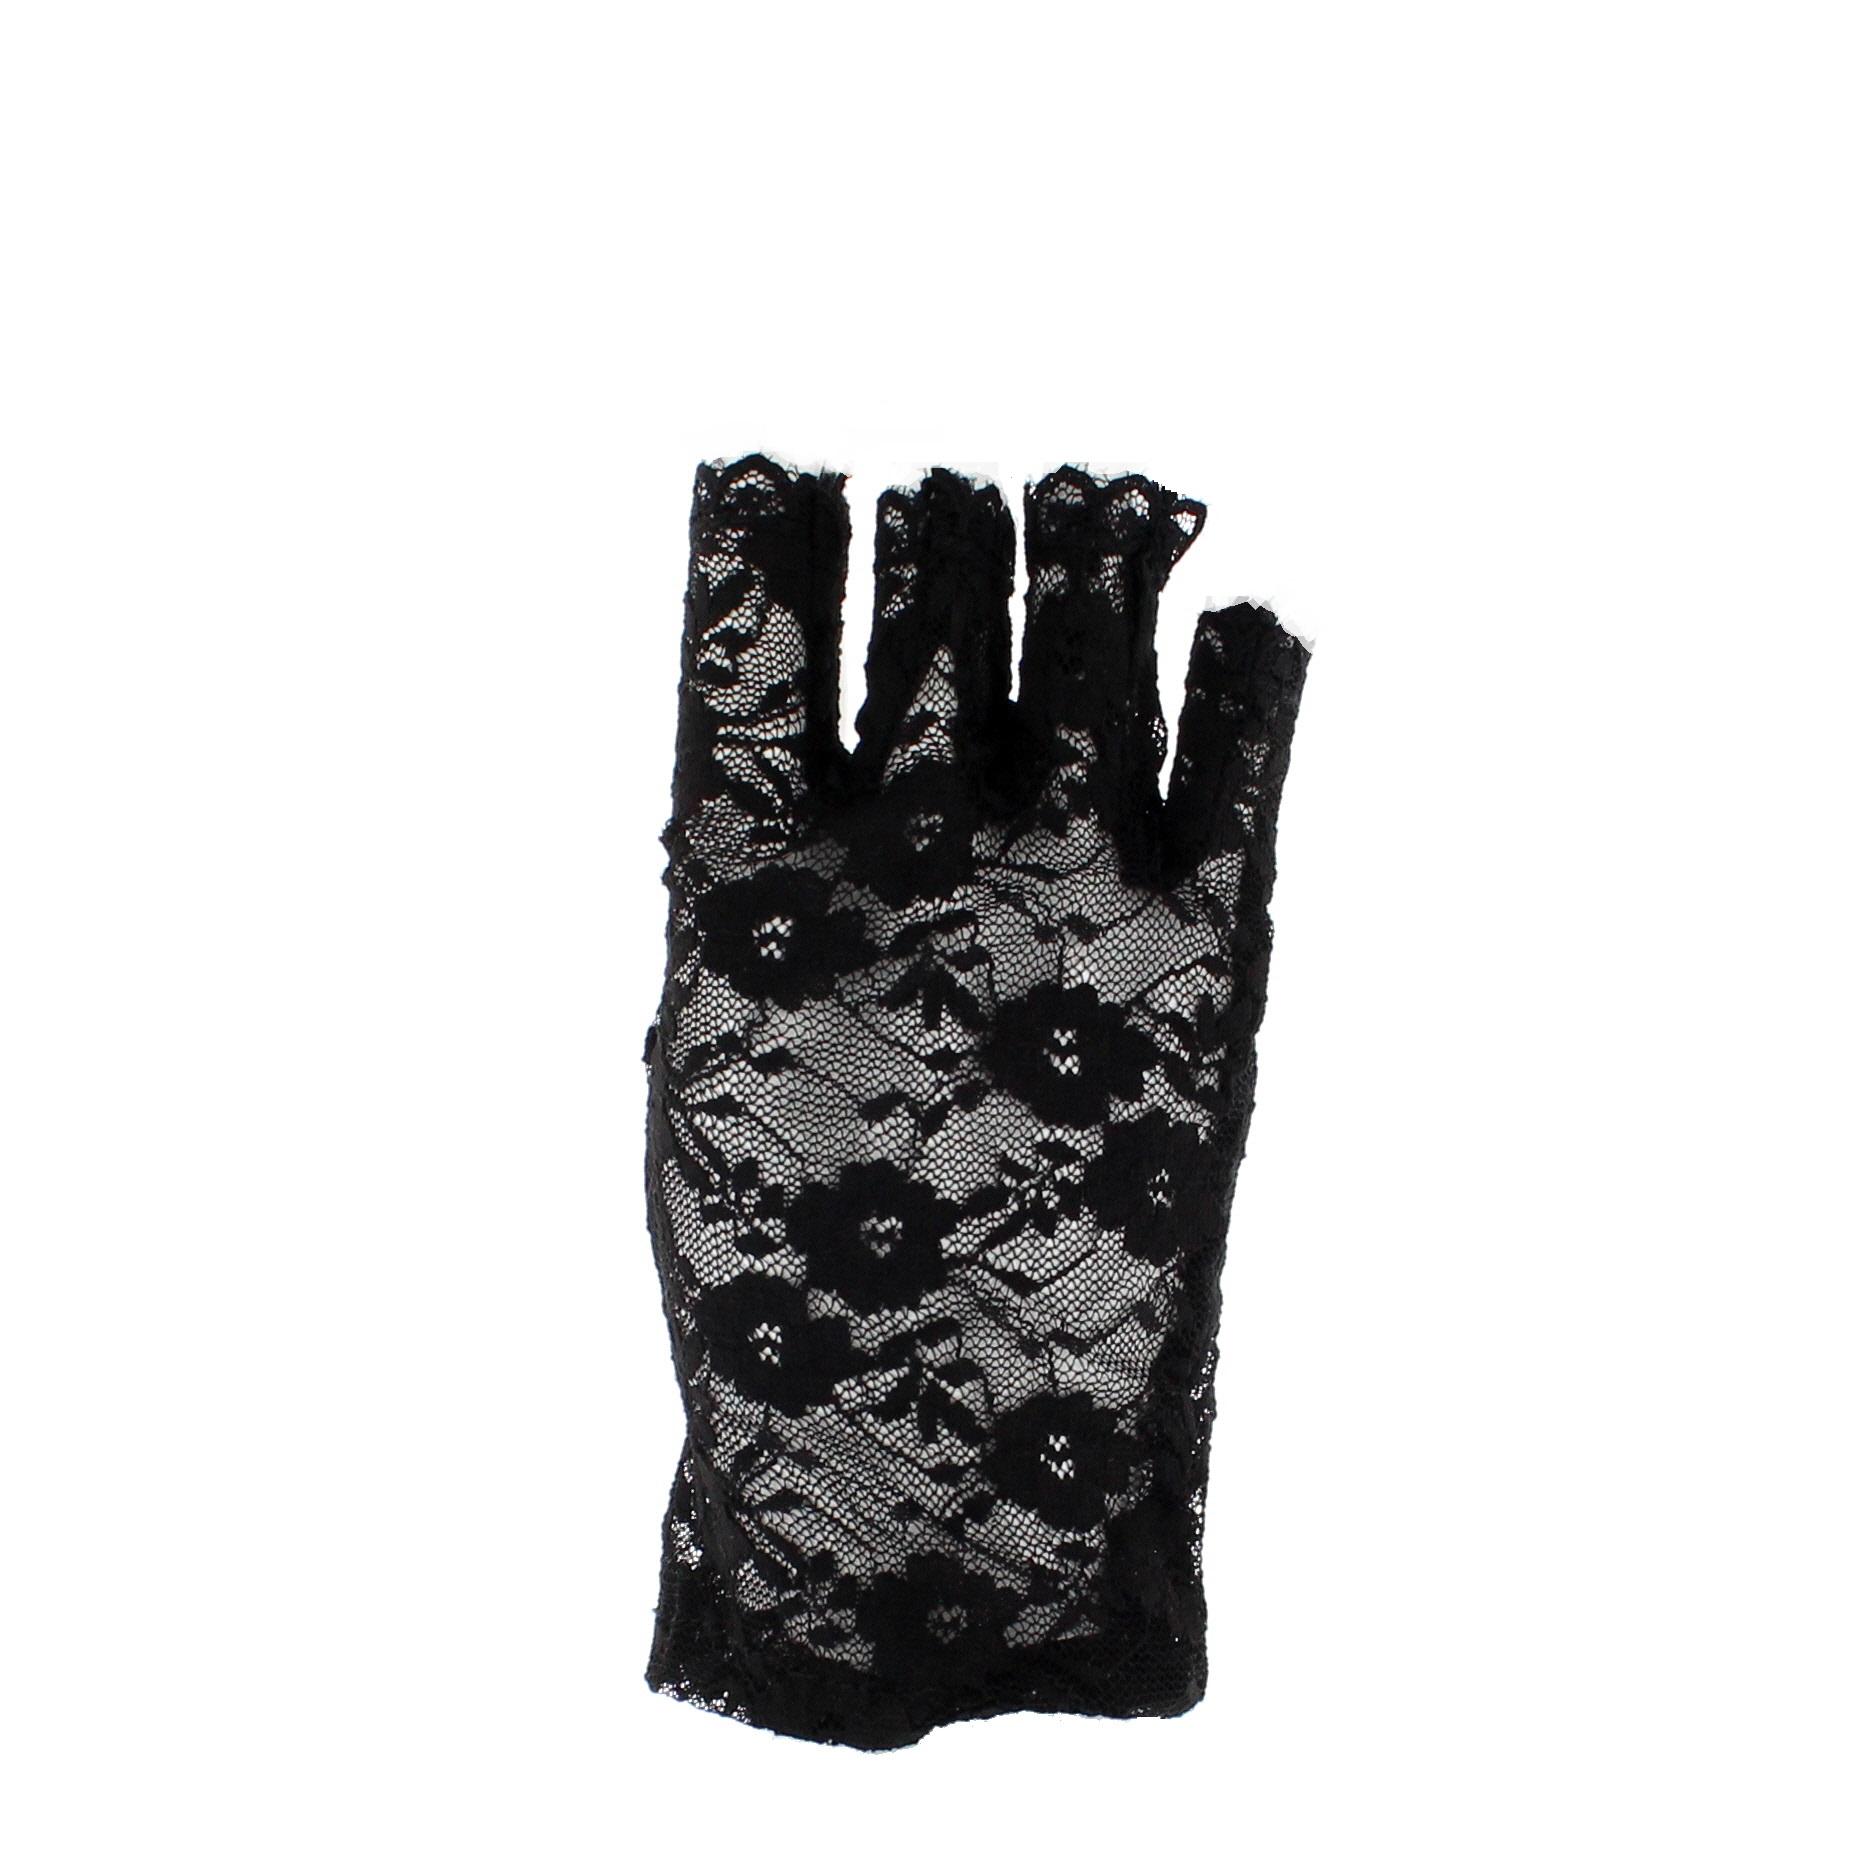 Zac-039-s-Alter-Ego-80s-Style-Short-Lace-Fingerless-Gloves